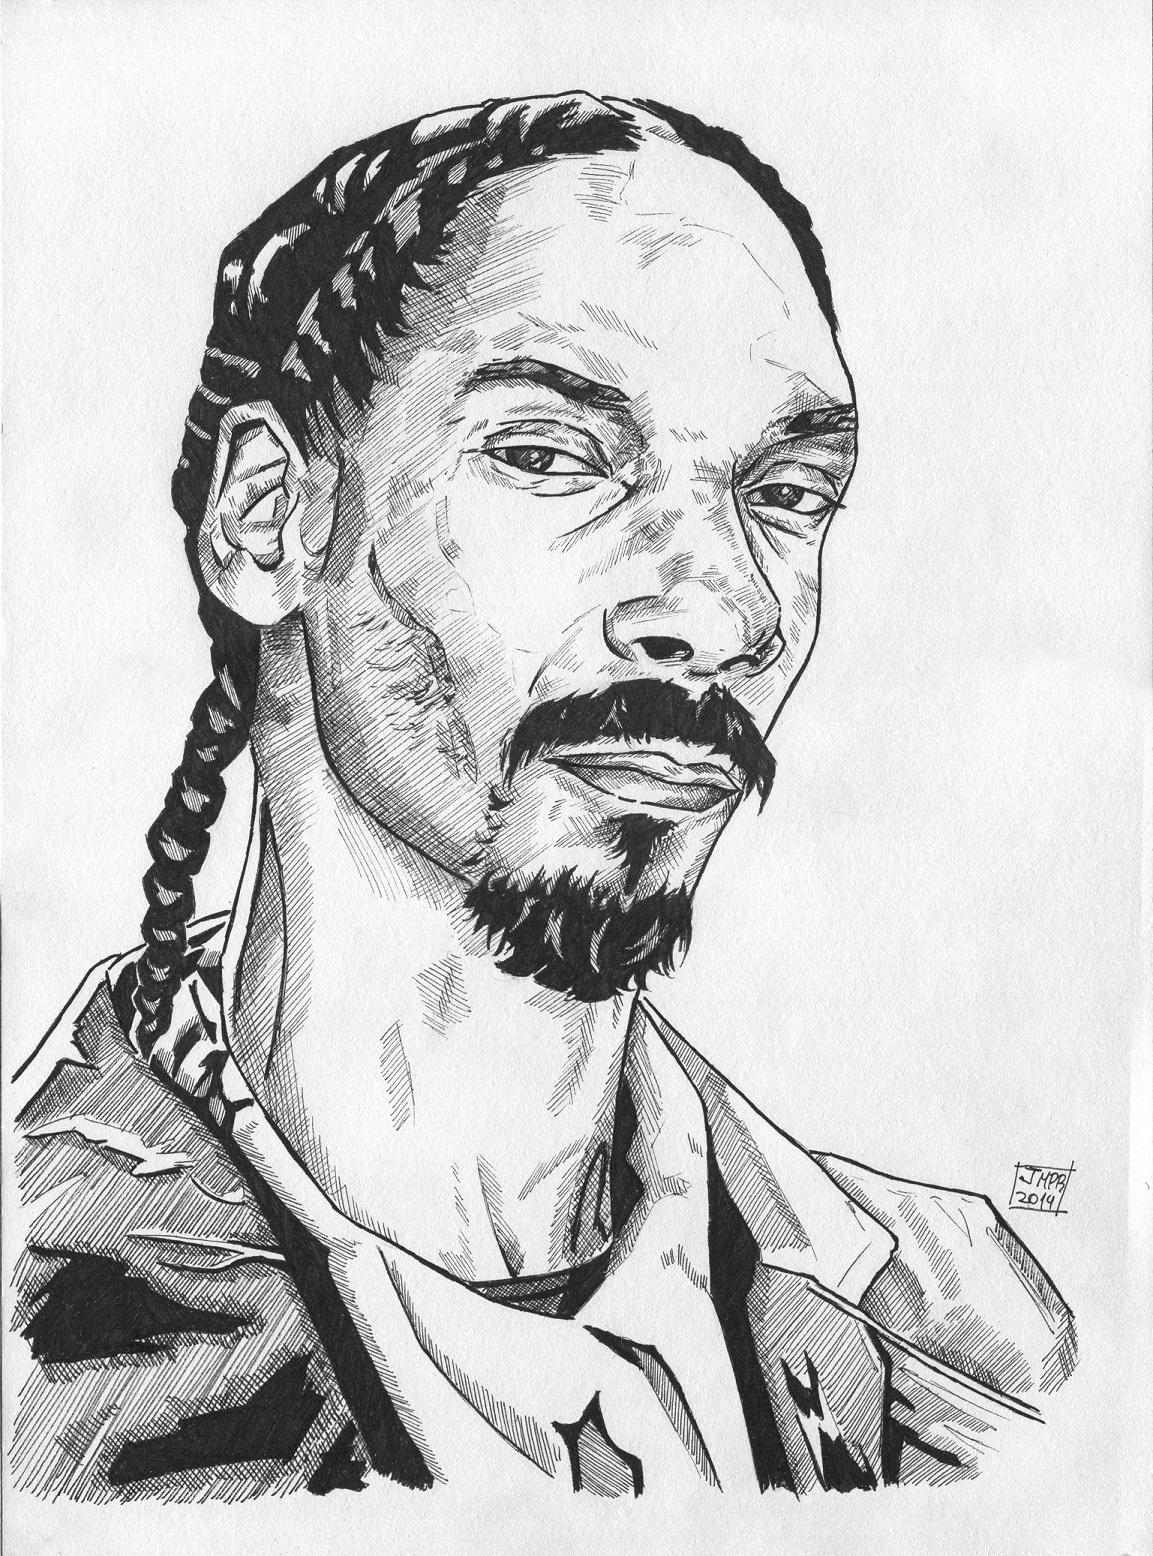 2pac With Snoop Dogg Las